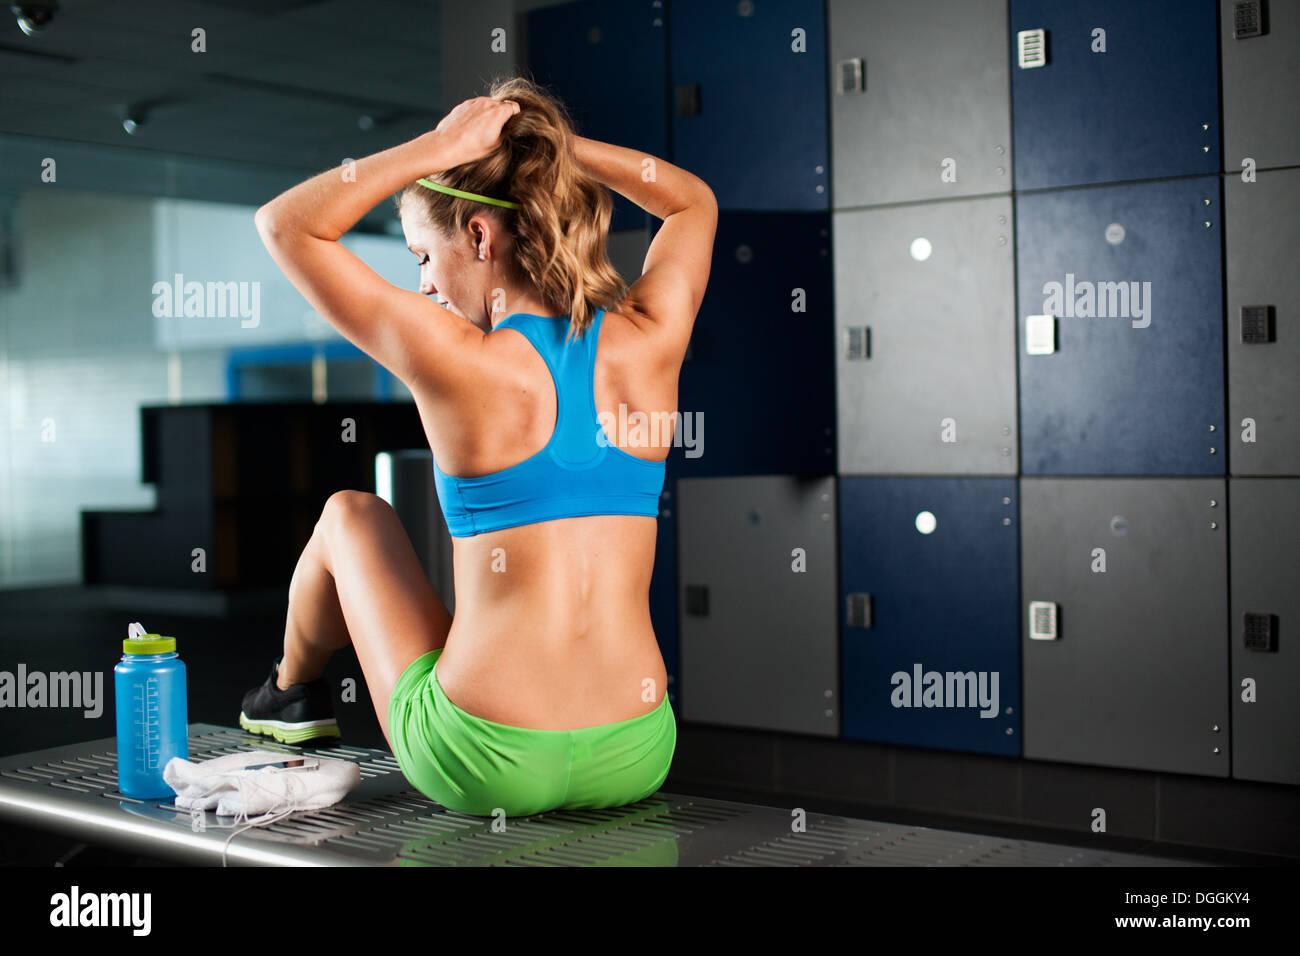 Junge Frau Pferdeschwanz binden, im Fitness-Studio Stockbild